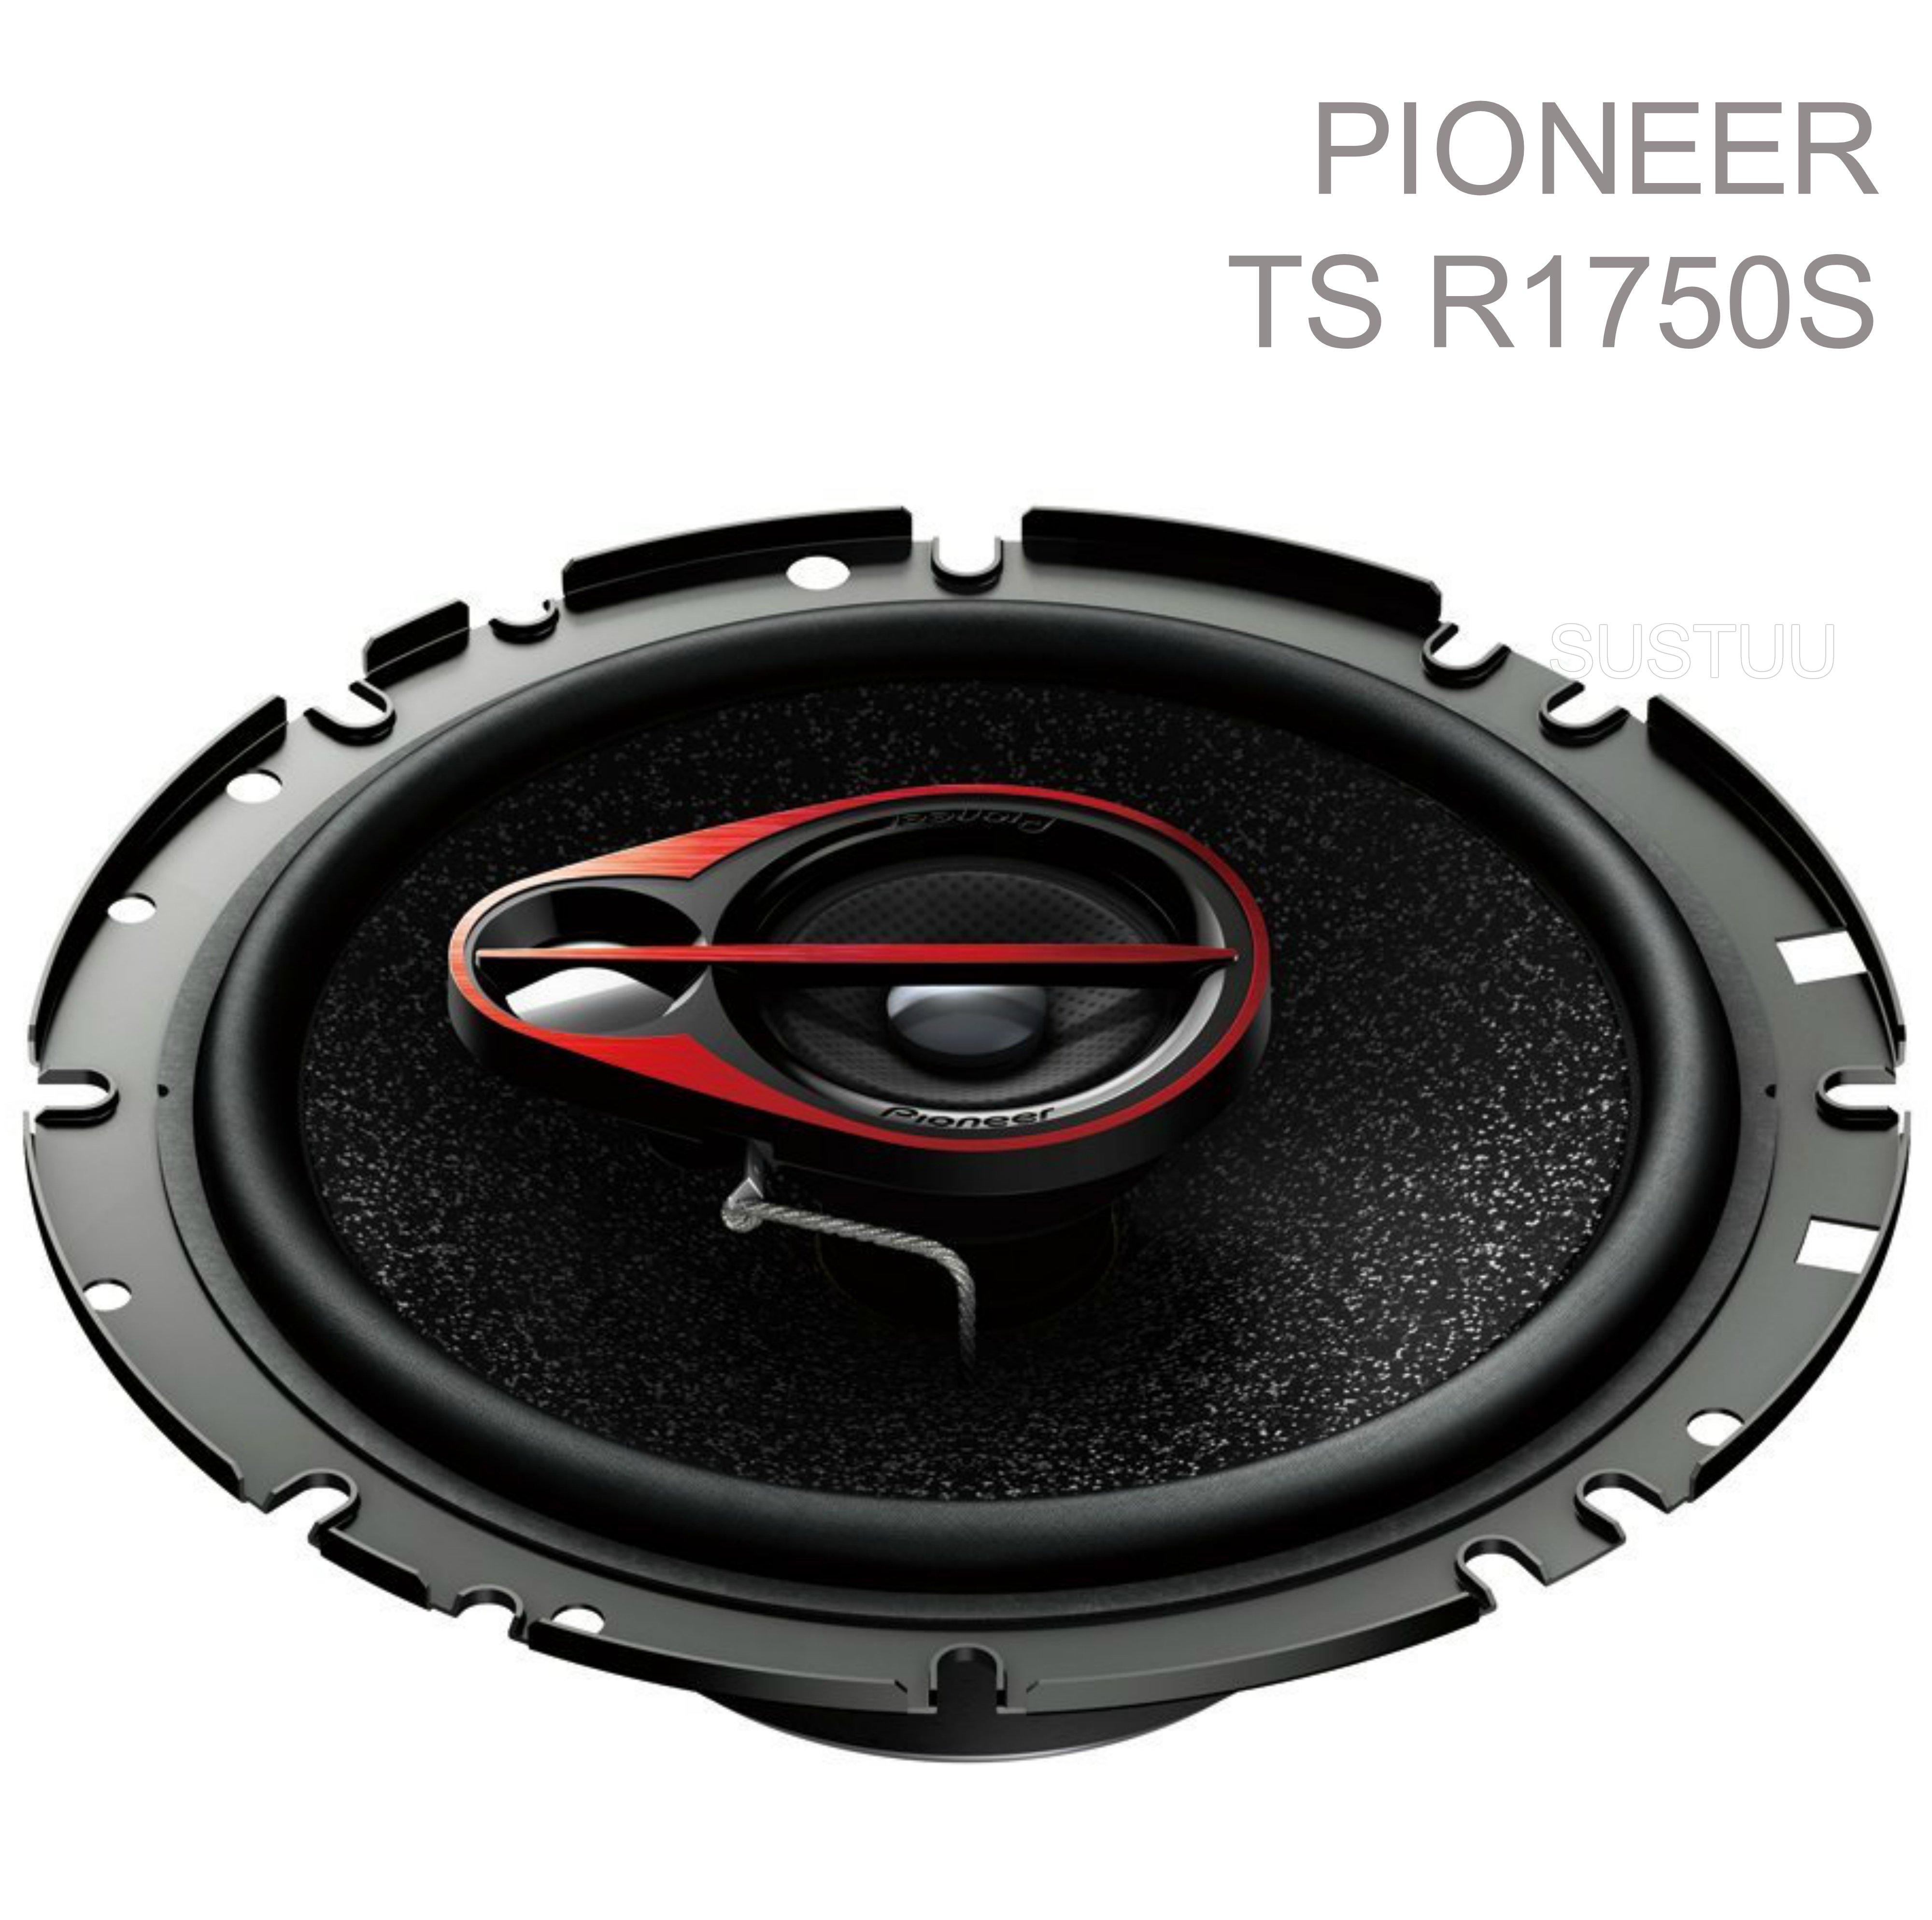 PIONEER TS R1750S 17cm 3 Way 250W In Car Vehicle Audio Sound Speaker